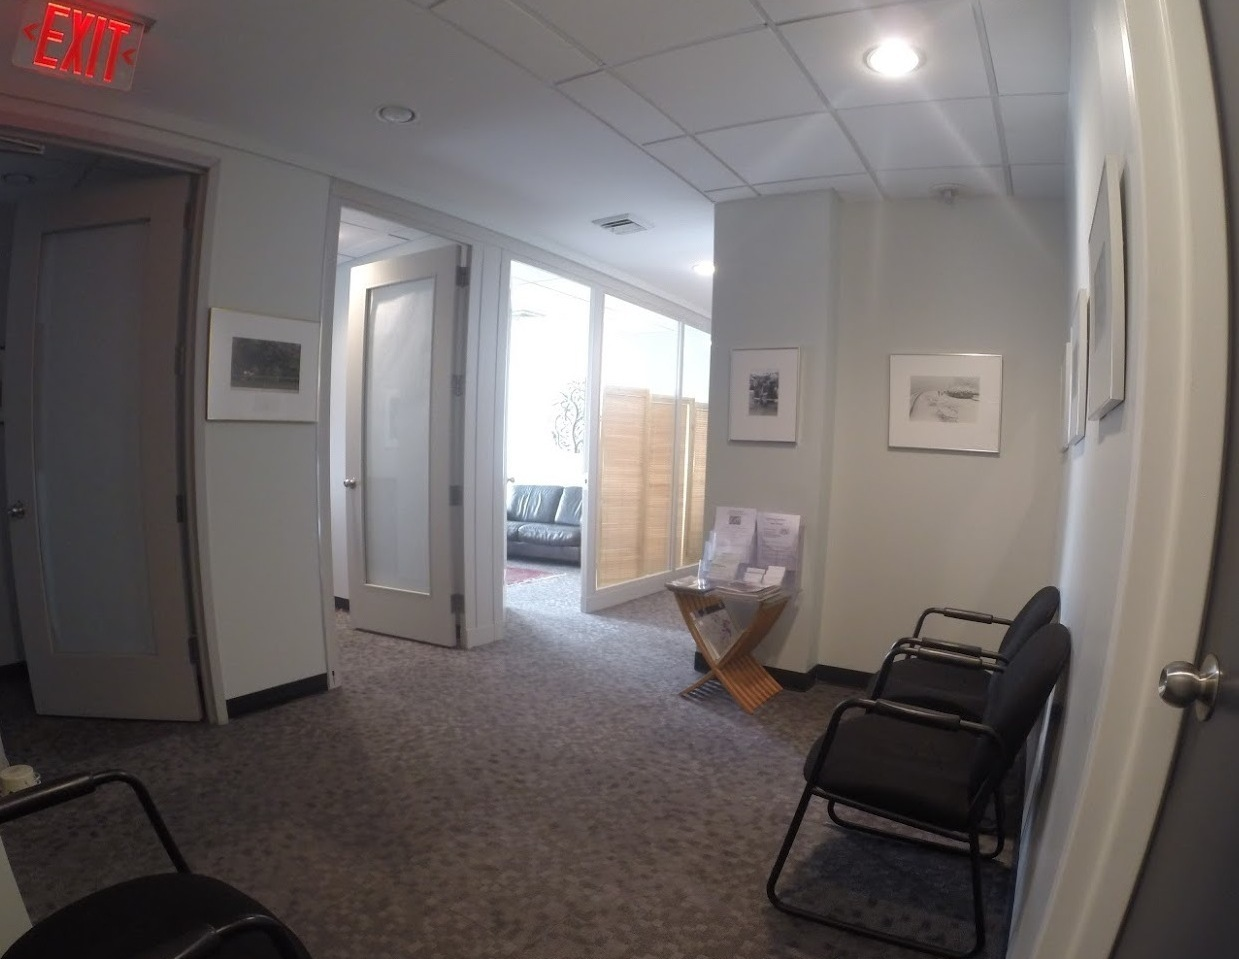 Waiting Room b cropped.JPG